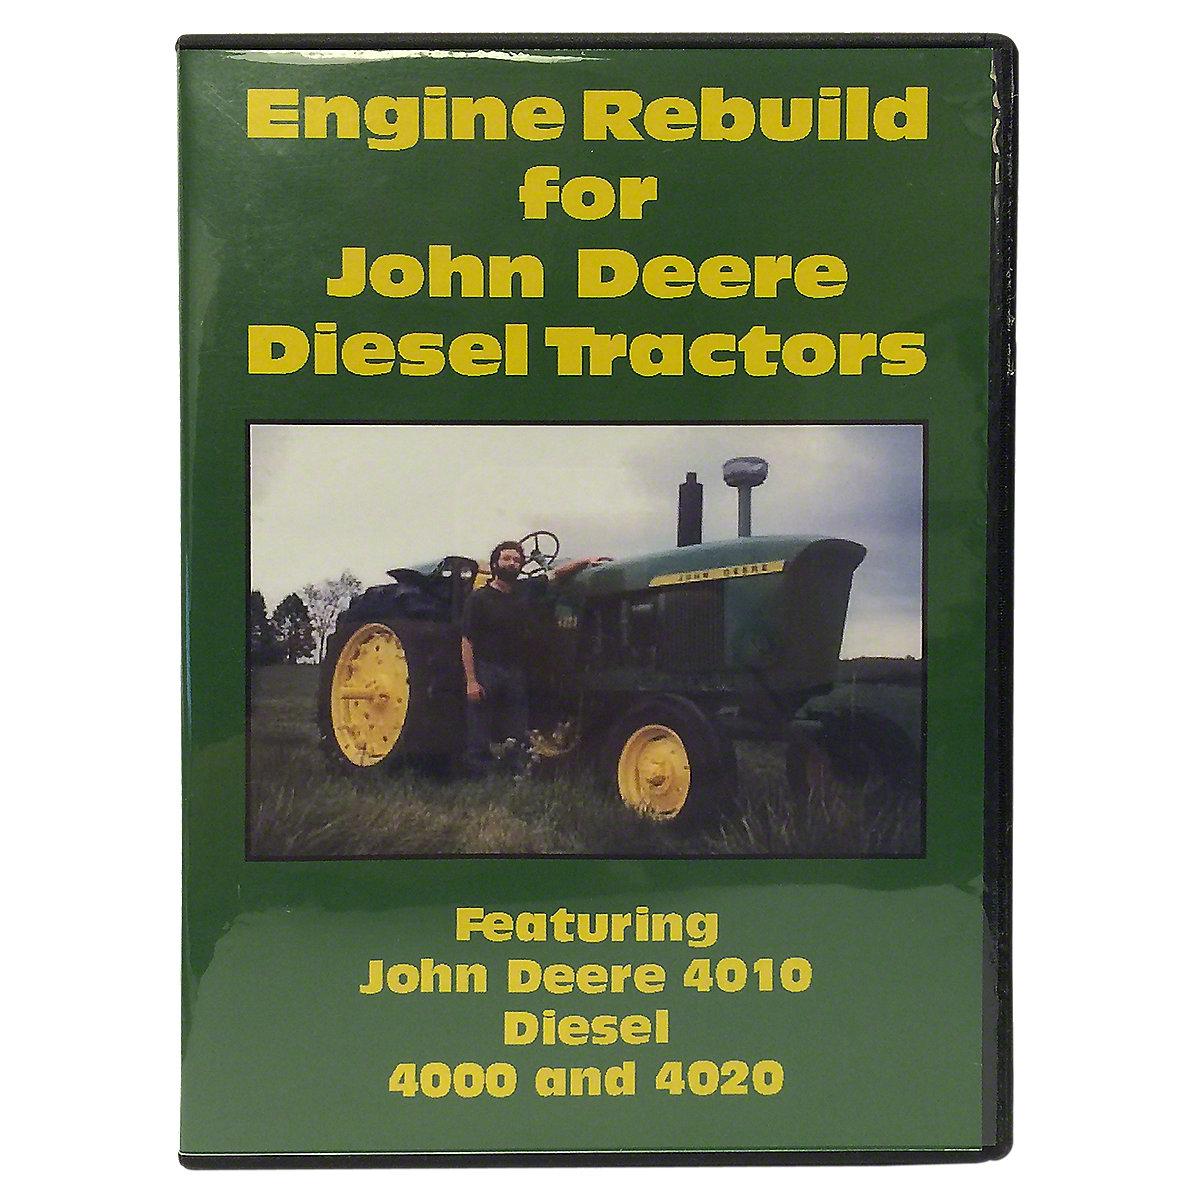 VID3425DJD Engine Rebuild Video (DVD)